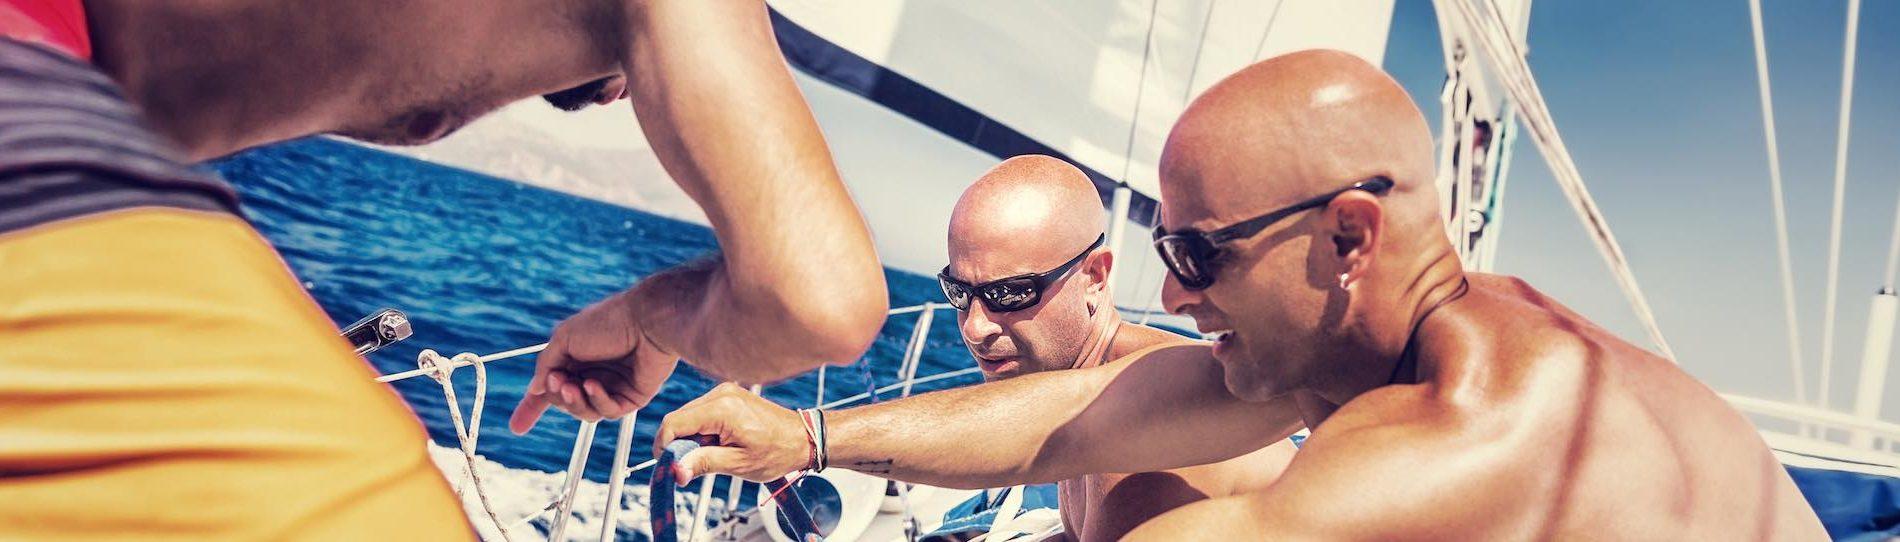 group of bucks on yacht